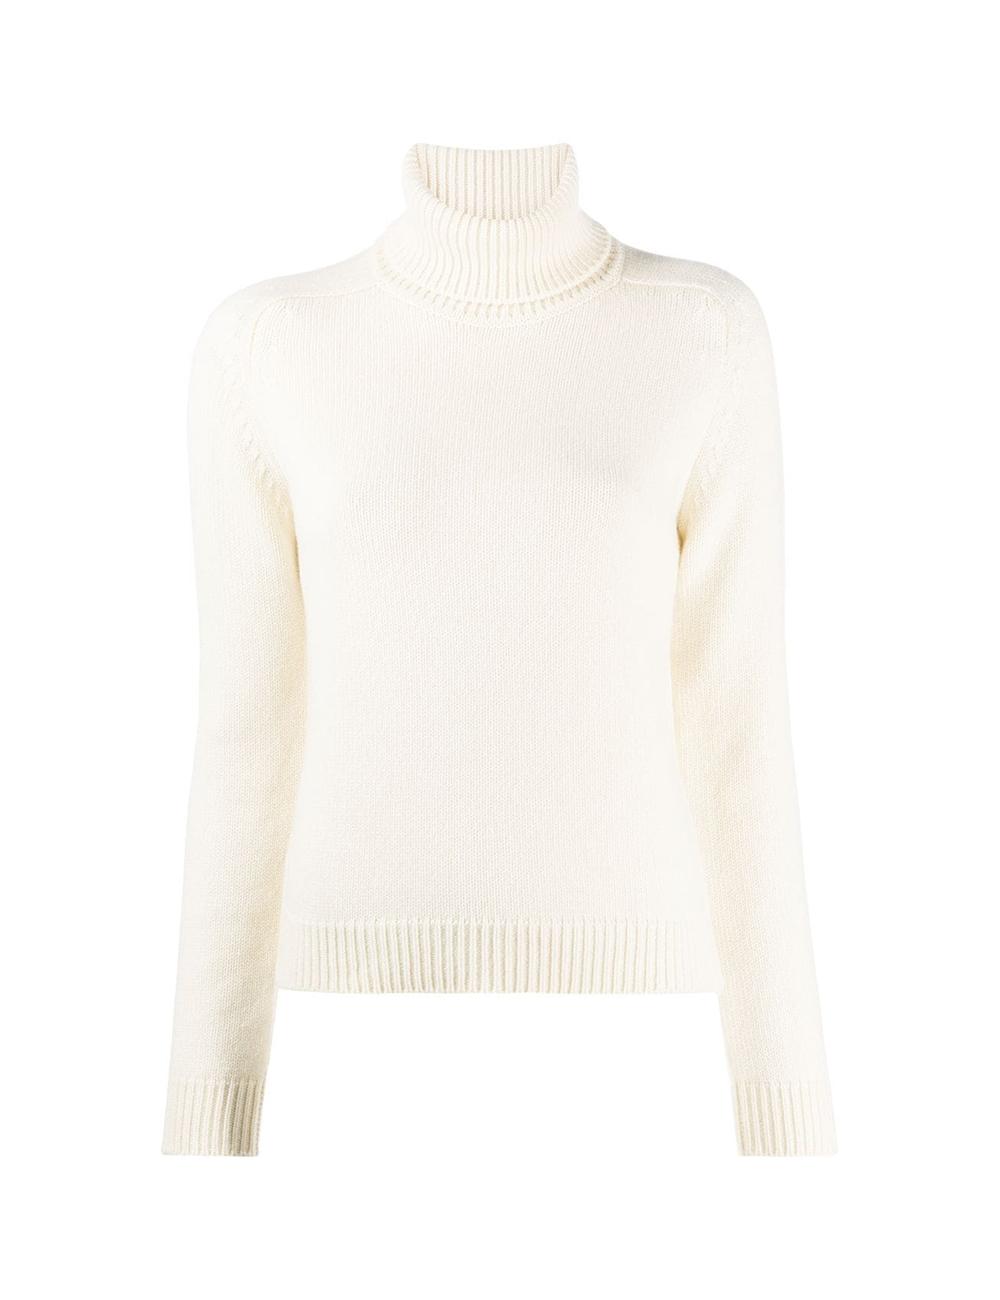 Turtleneck pullover Saint Laurent - BIG BOSS MEGEVE